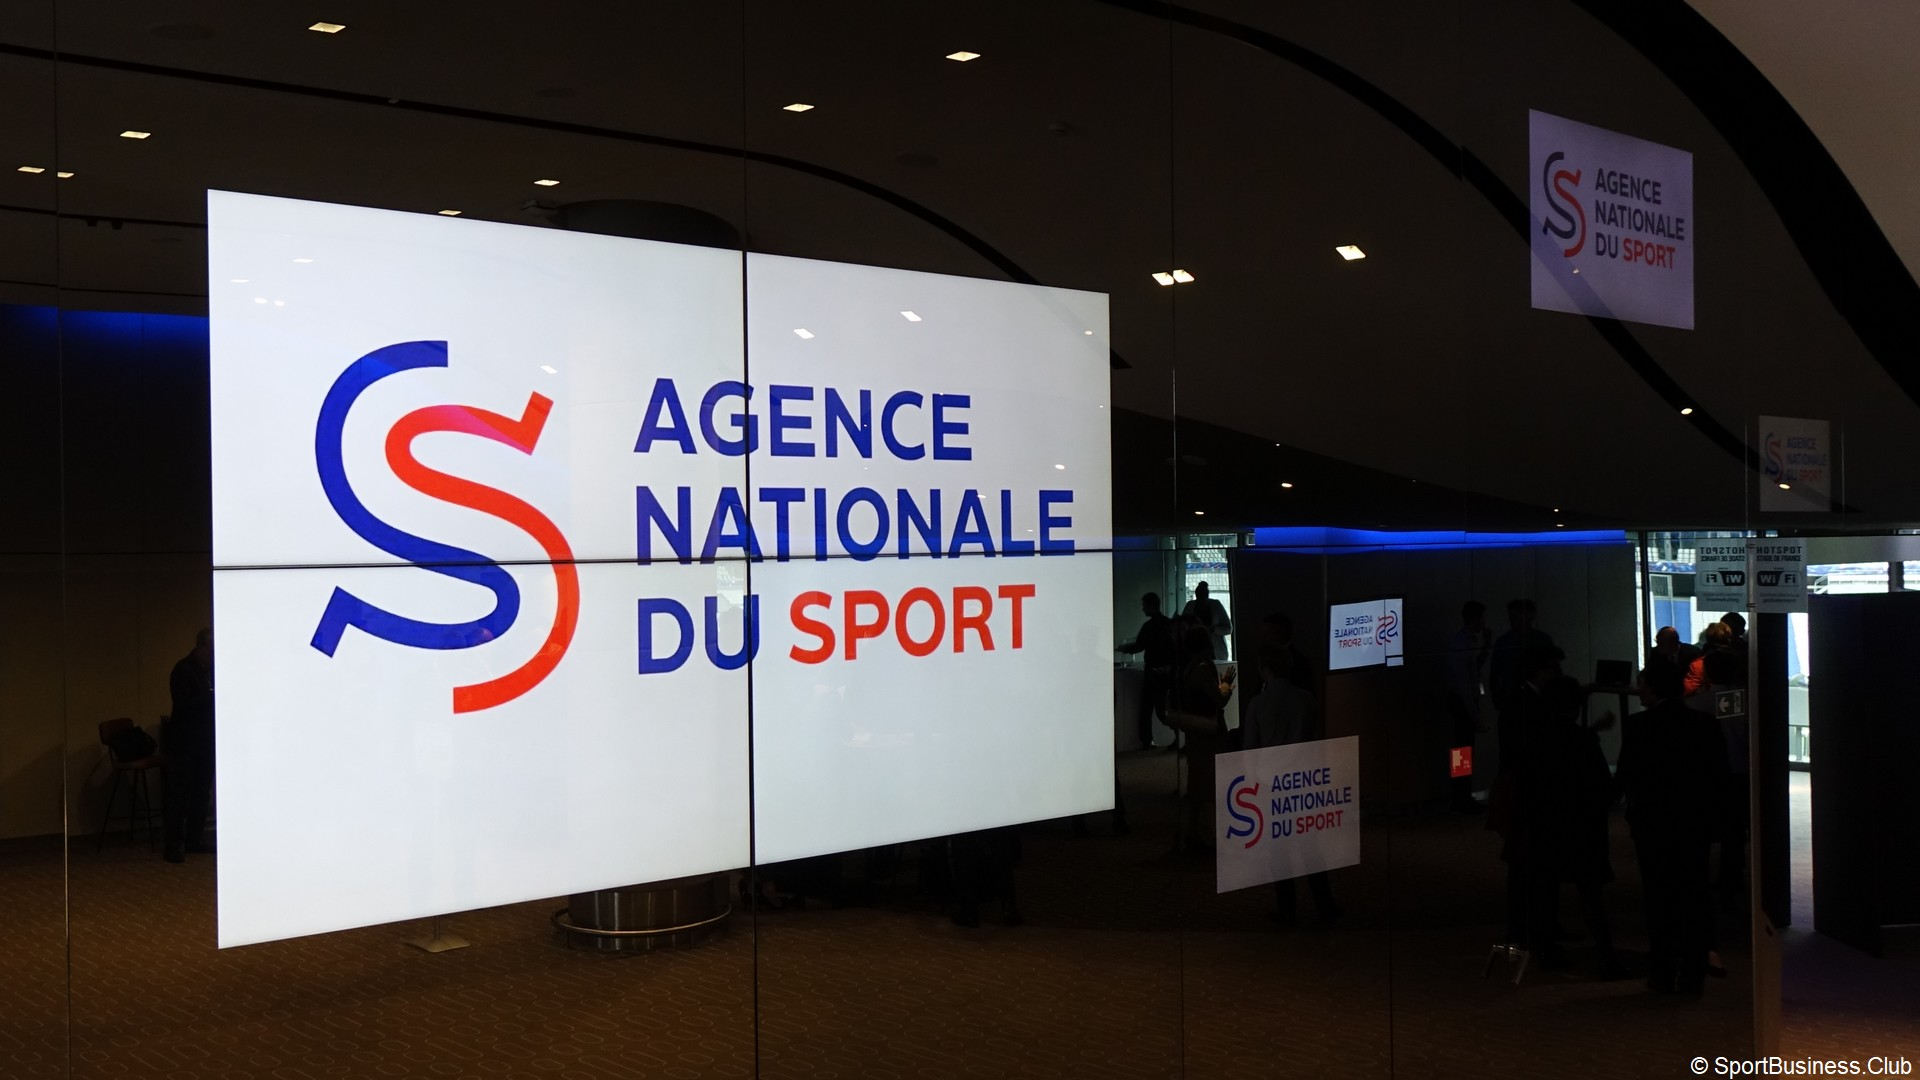 Agence Nationale du Sport (3) Logo